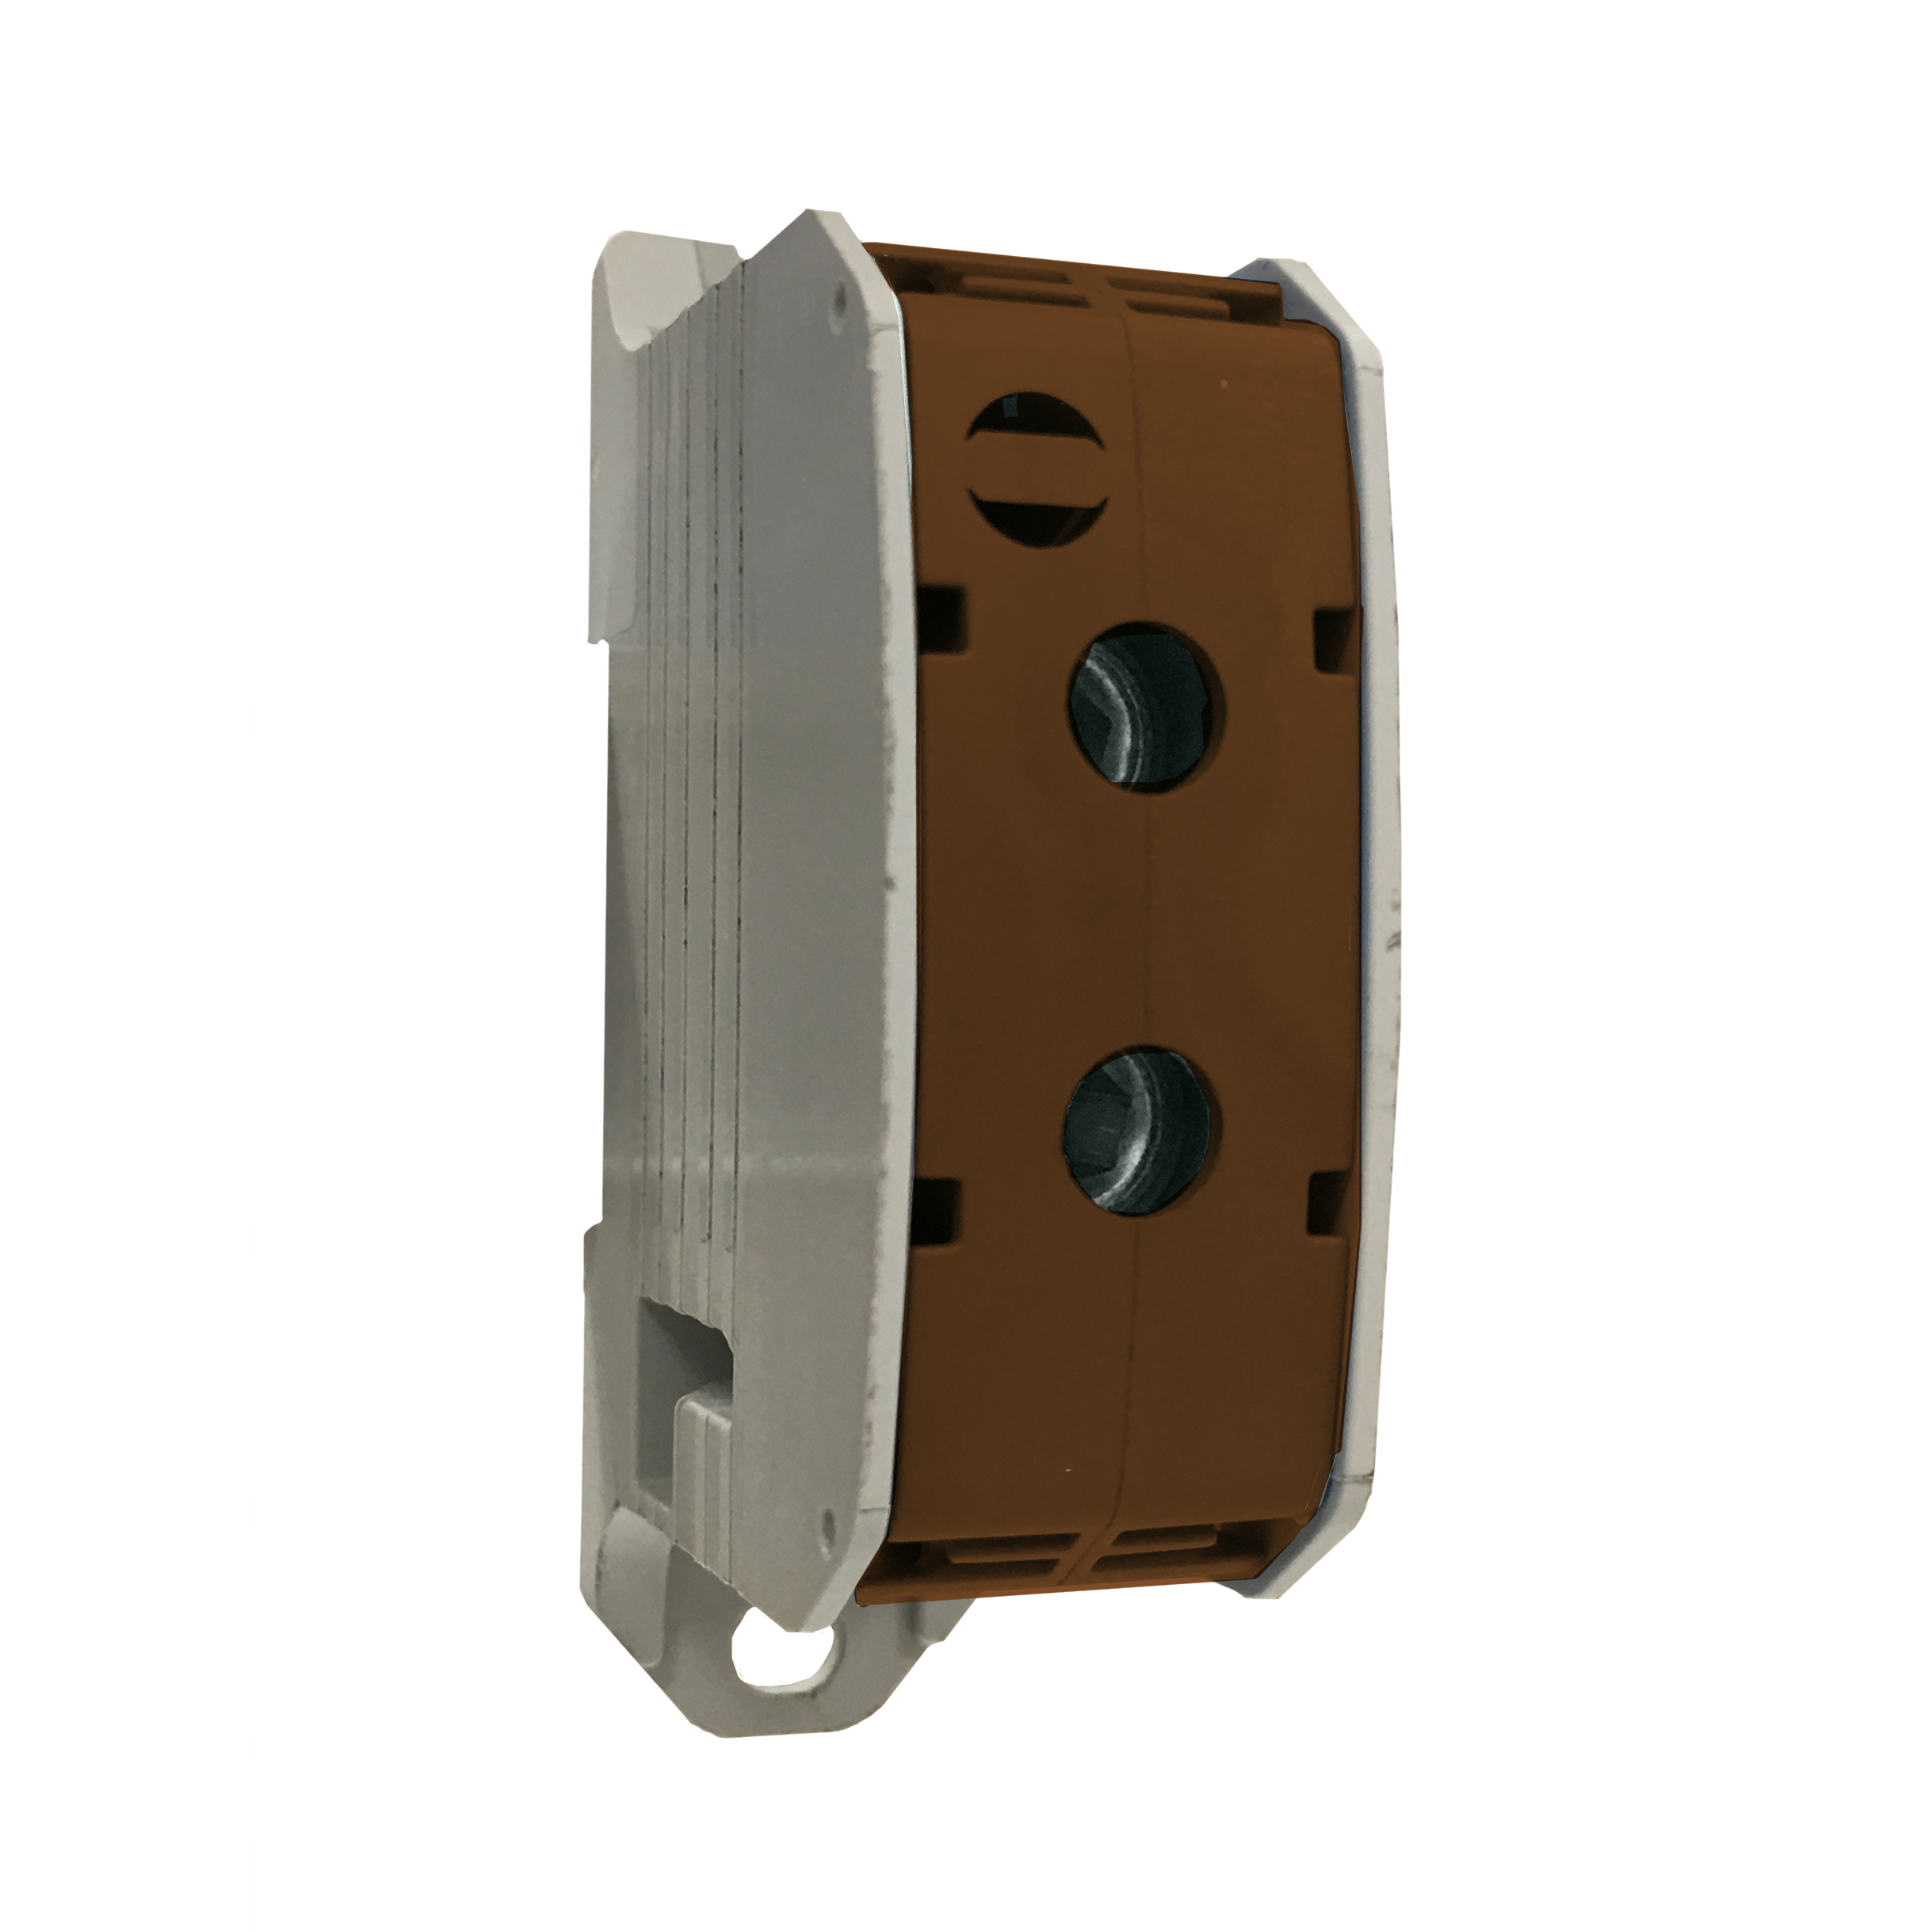 1 Stk Aluminium /Kupfer Klemme, 1-polig, 300mm² braun IKA21740--